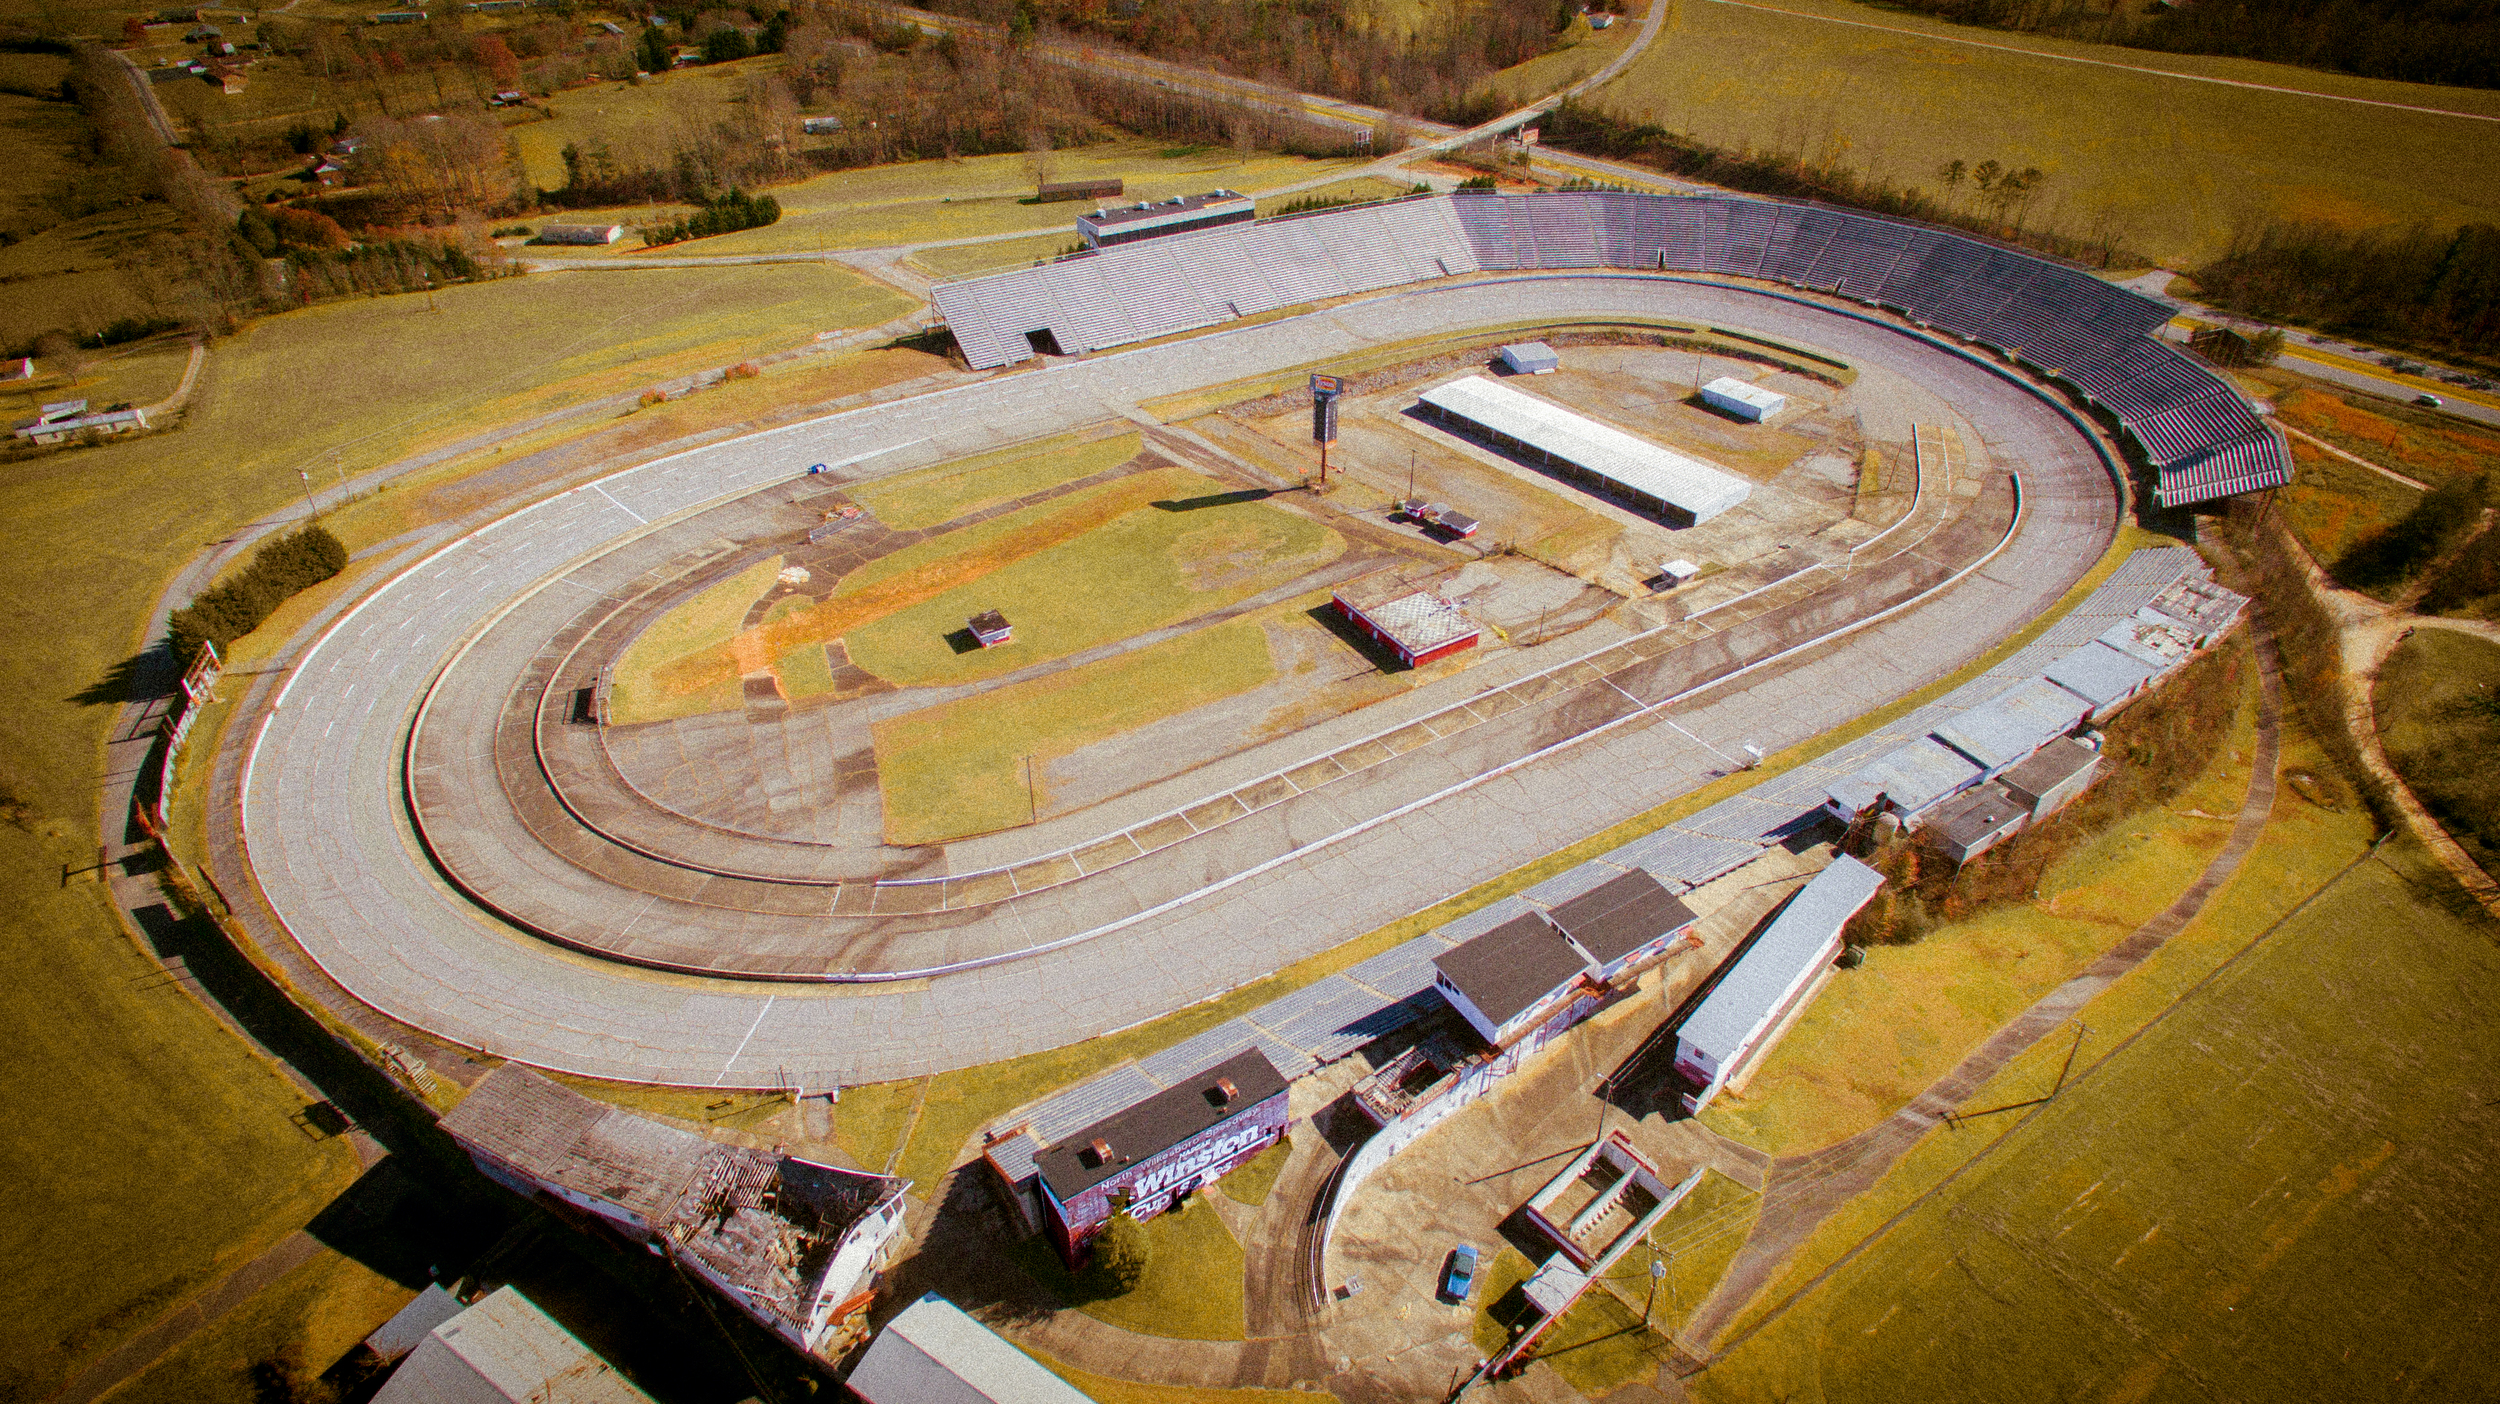 This Was North Wilkesboro Speedway